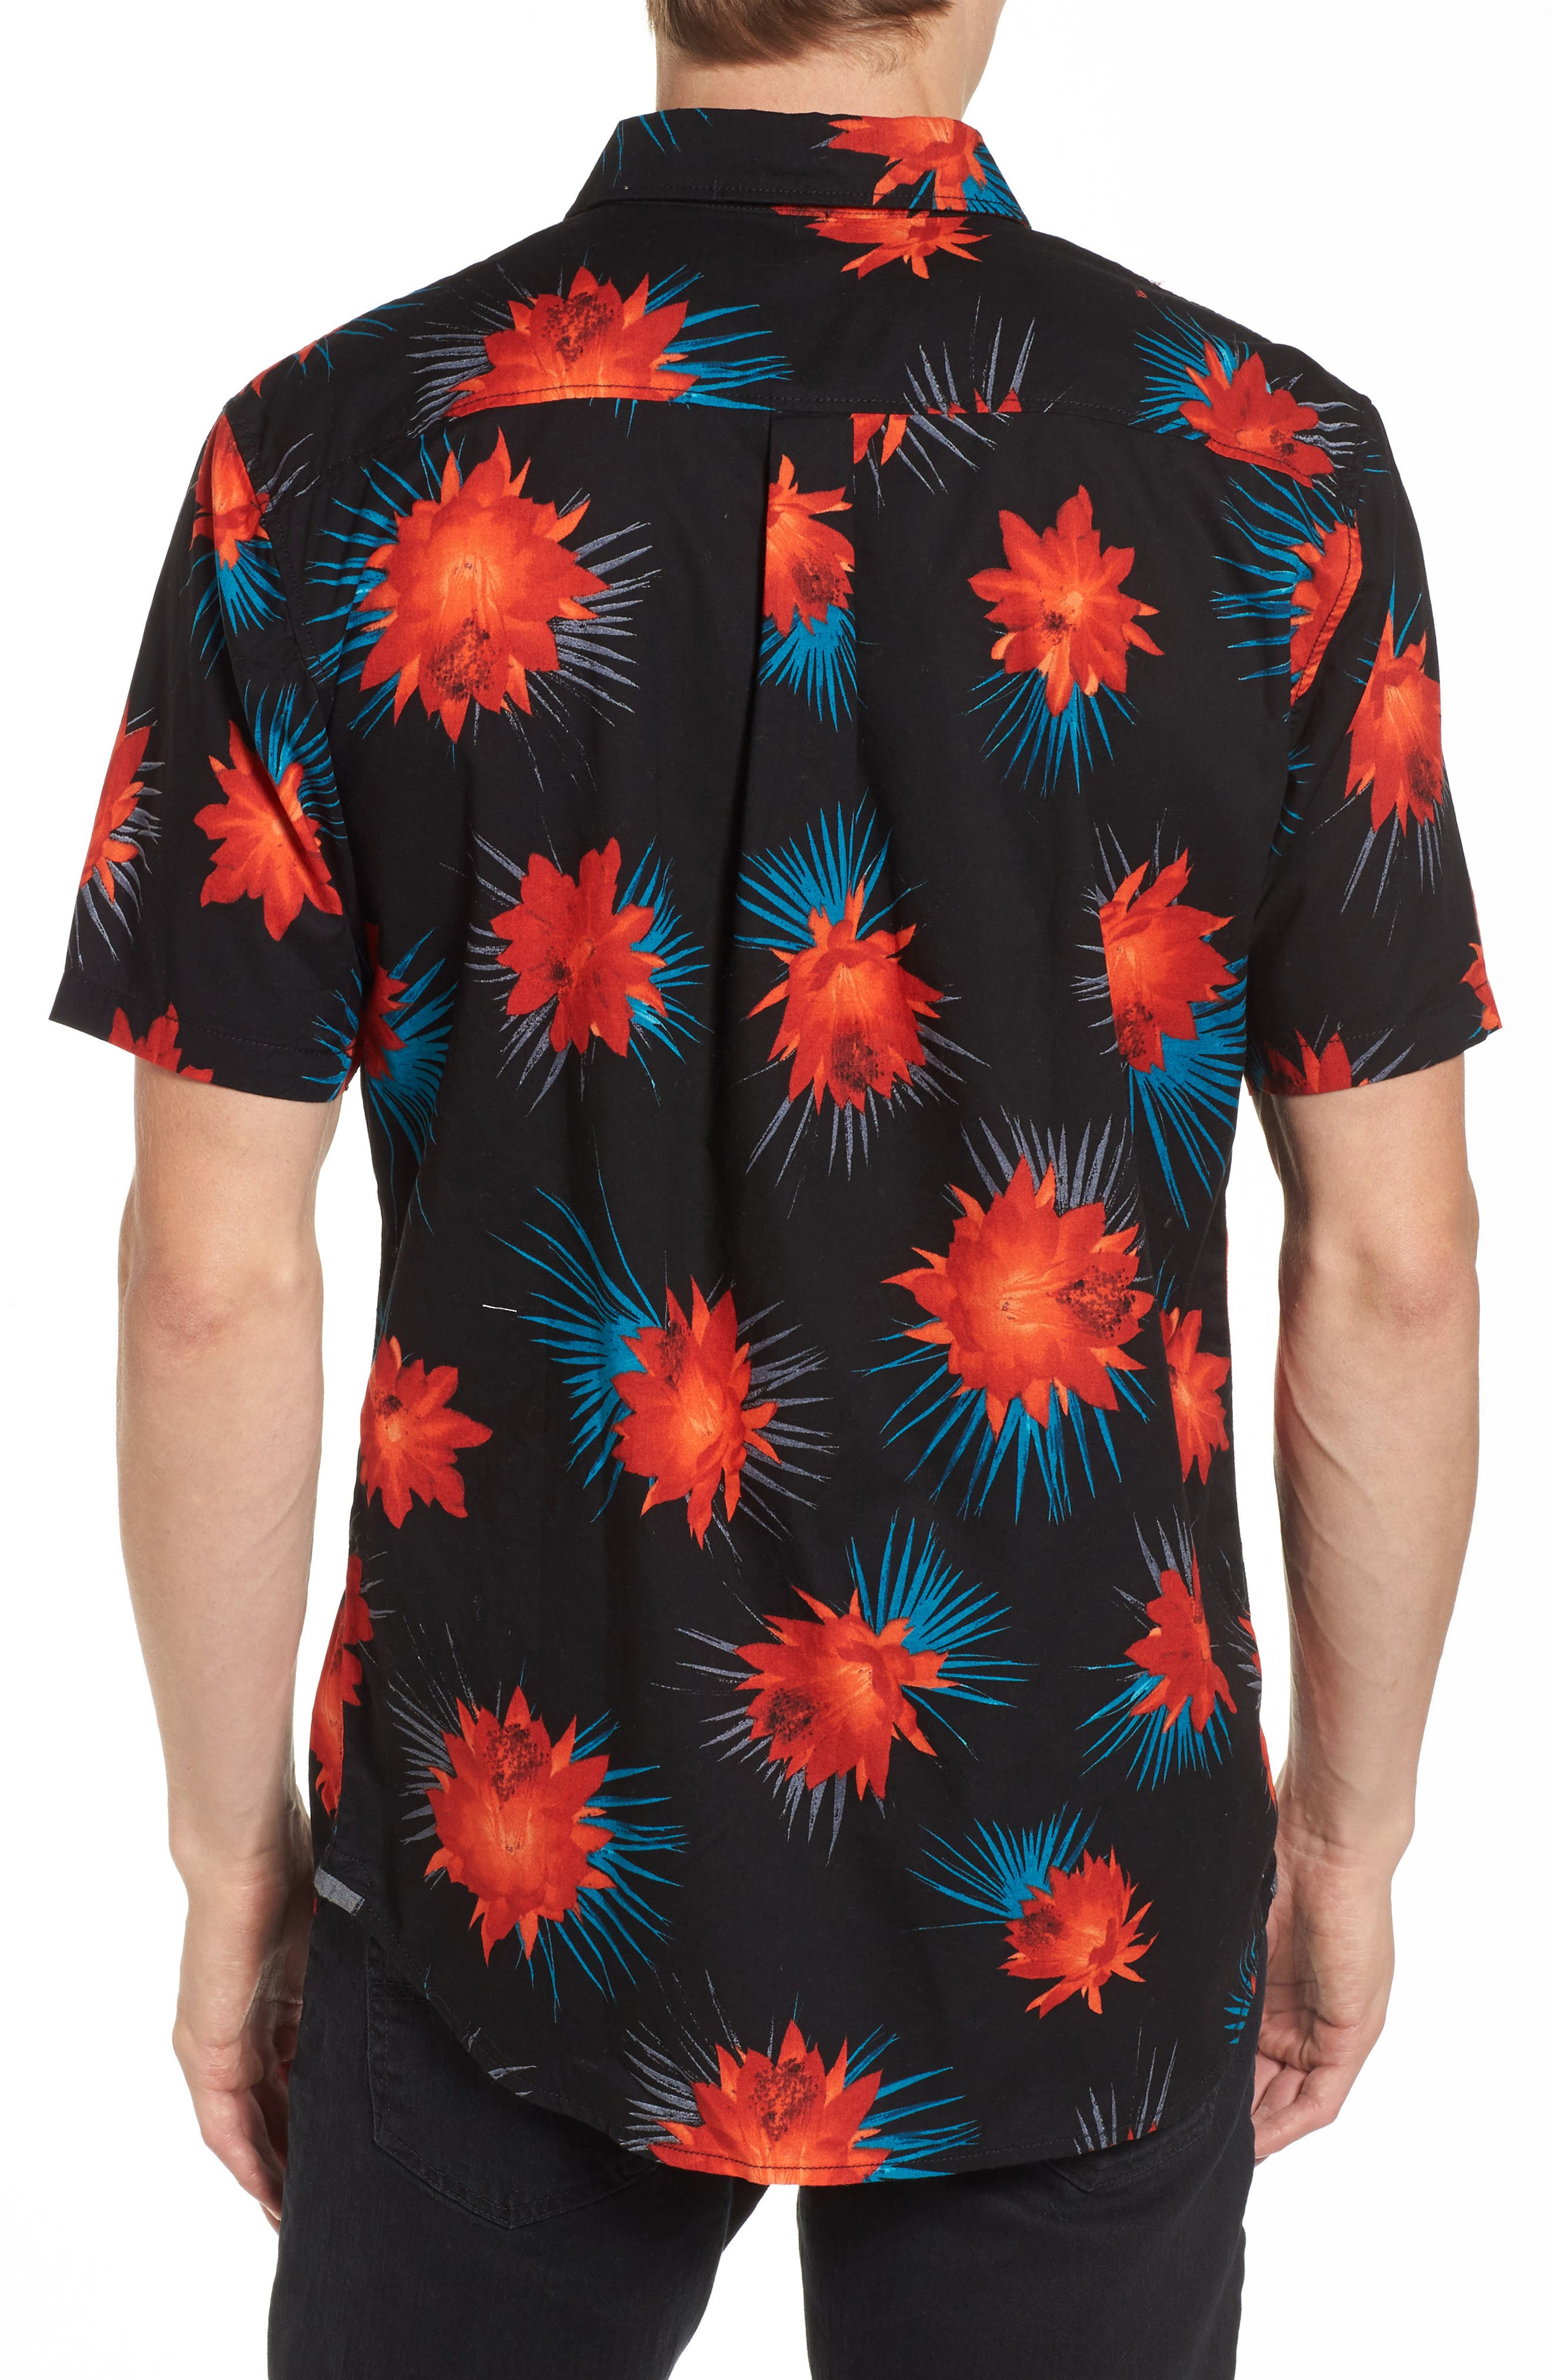 Cultivar Woven Shirt,                             Alternate thumbnail 2, color,                             001